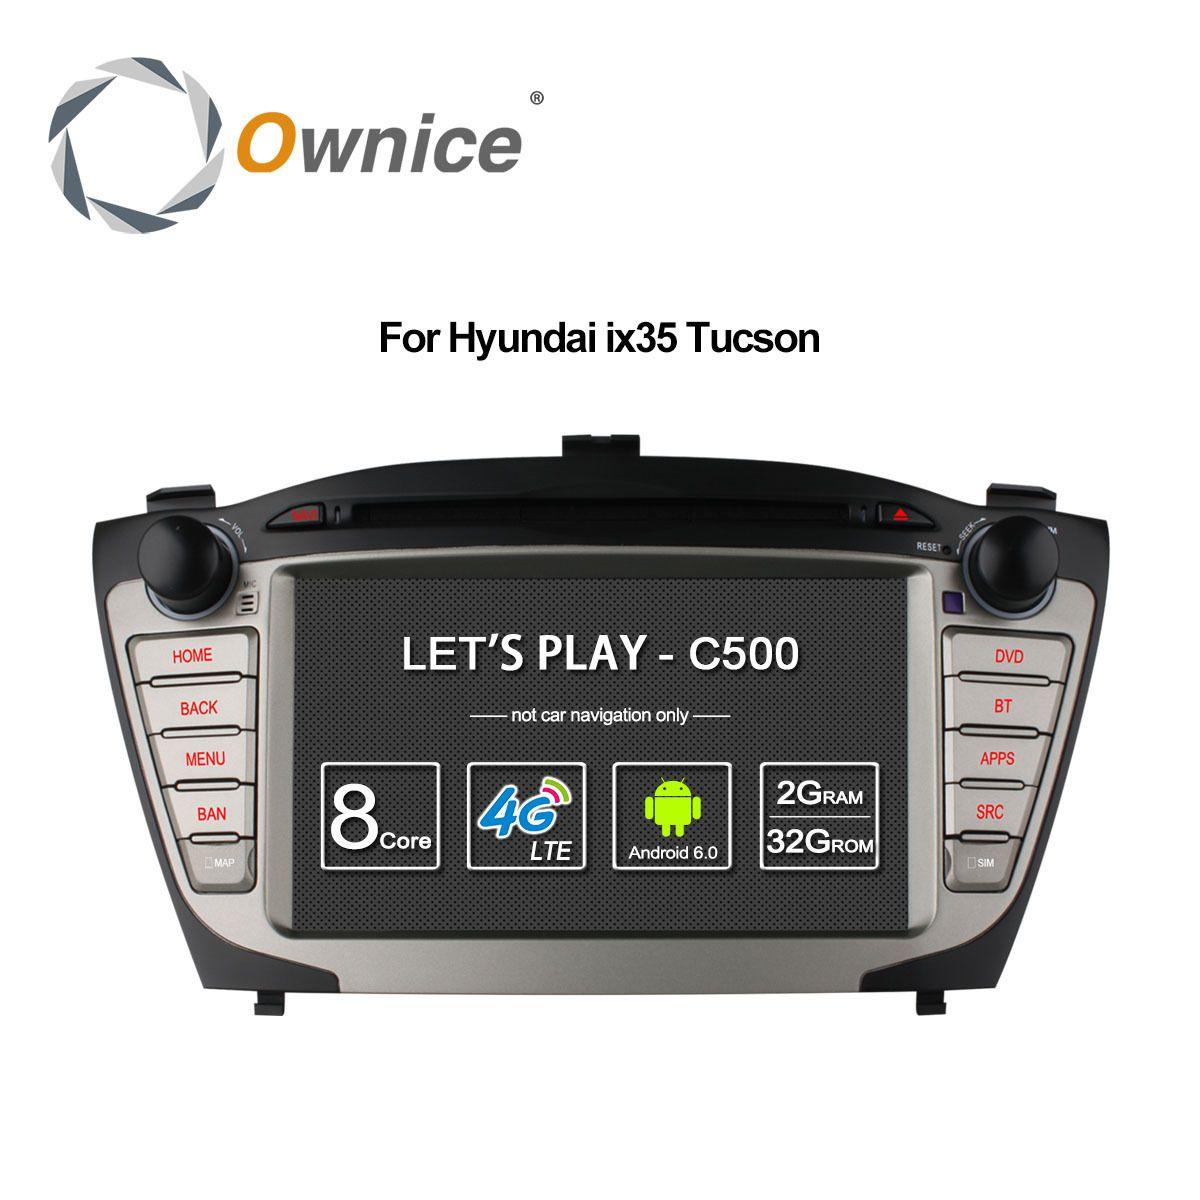 Ownice C500 4G SIM LTE for Hyundai iX35 Tucson 2009 - 2015 Android 6.0 8 Core 2 din car dvd gps radio 2GB RAM 32GB support DAB+